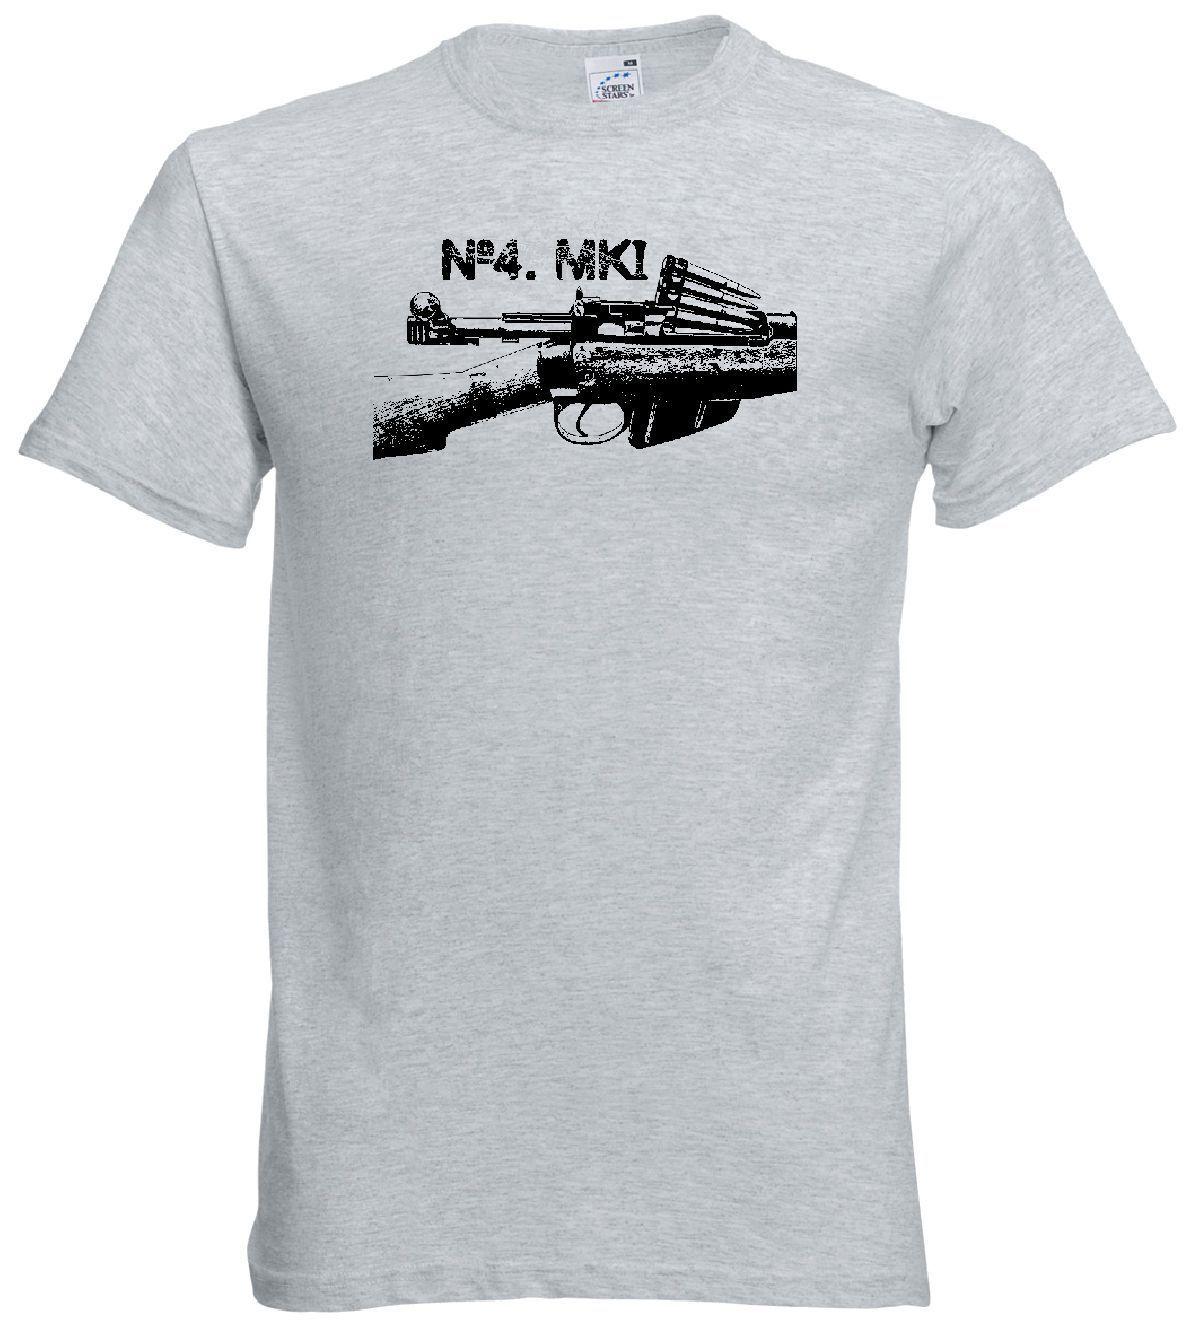 2019 verano gran oferta camiseta para hombre Enfield No4 Mk1 Rifle camiseta WWII británico 303 Longbranch, Jungle Carbine